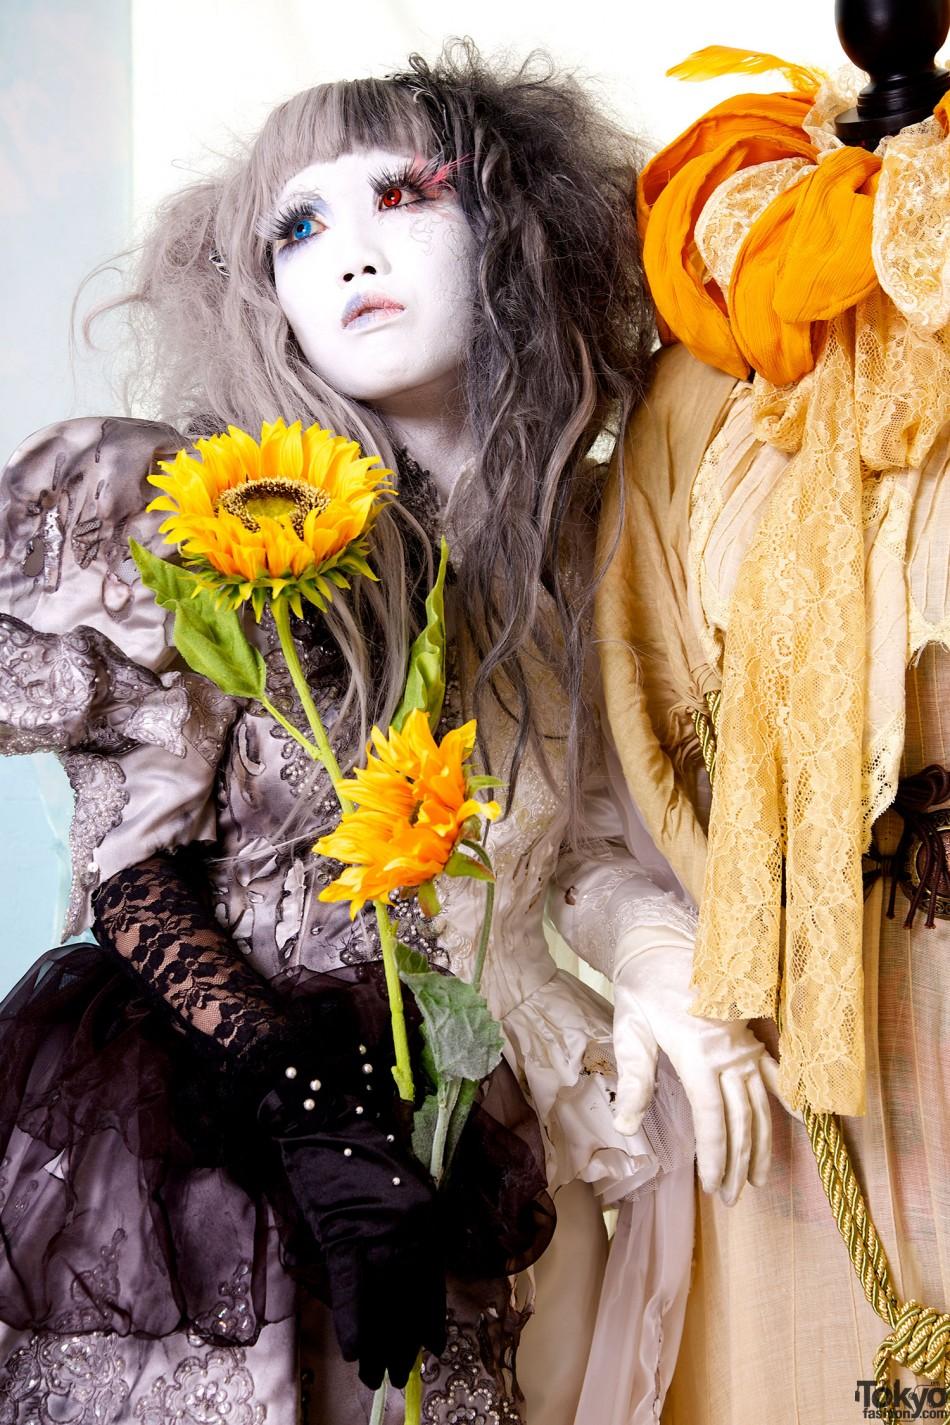 Minori - Her Memories of a Dream (7)